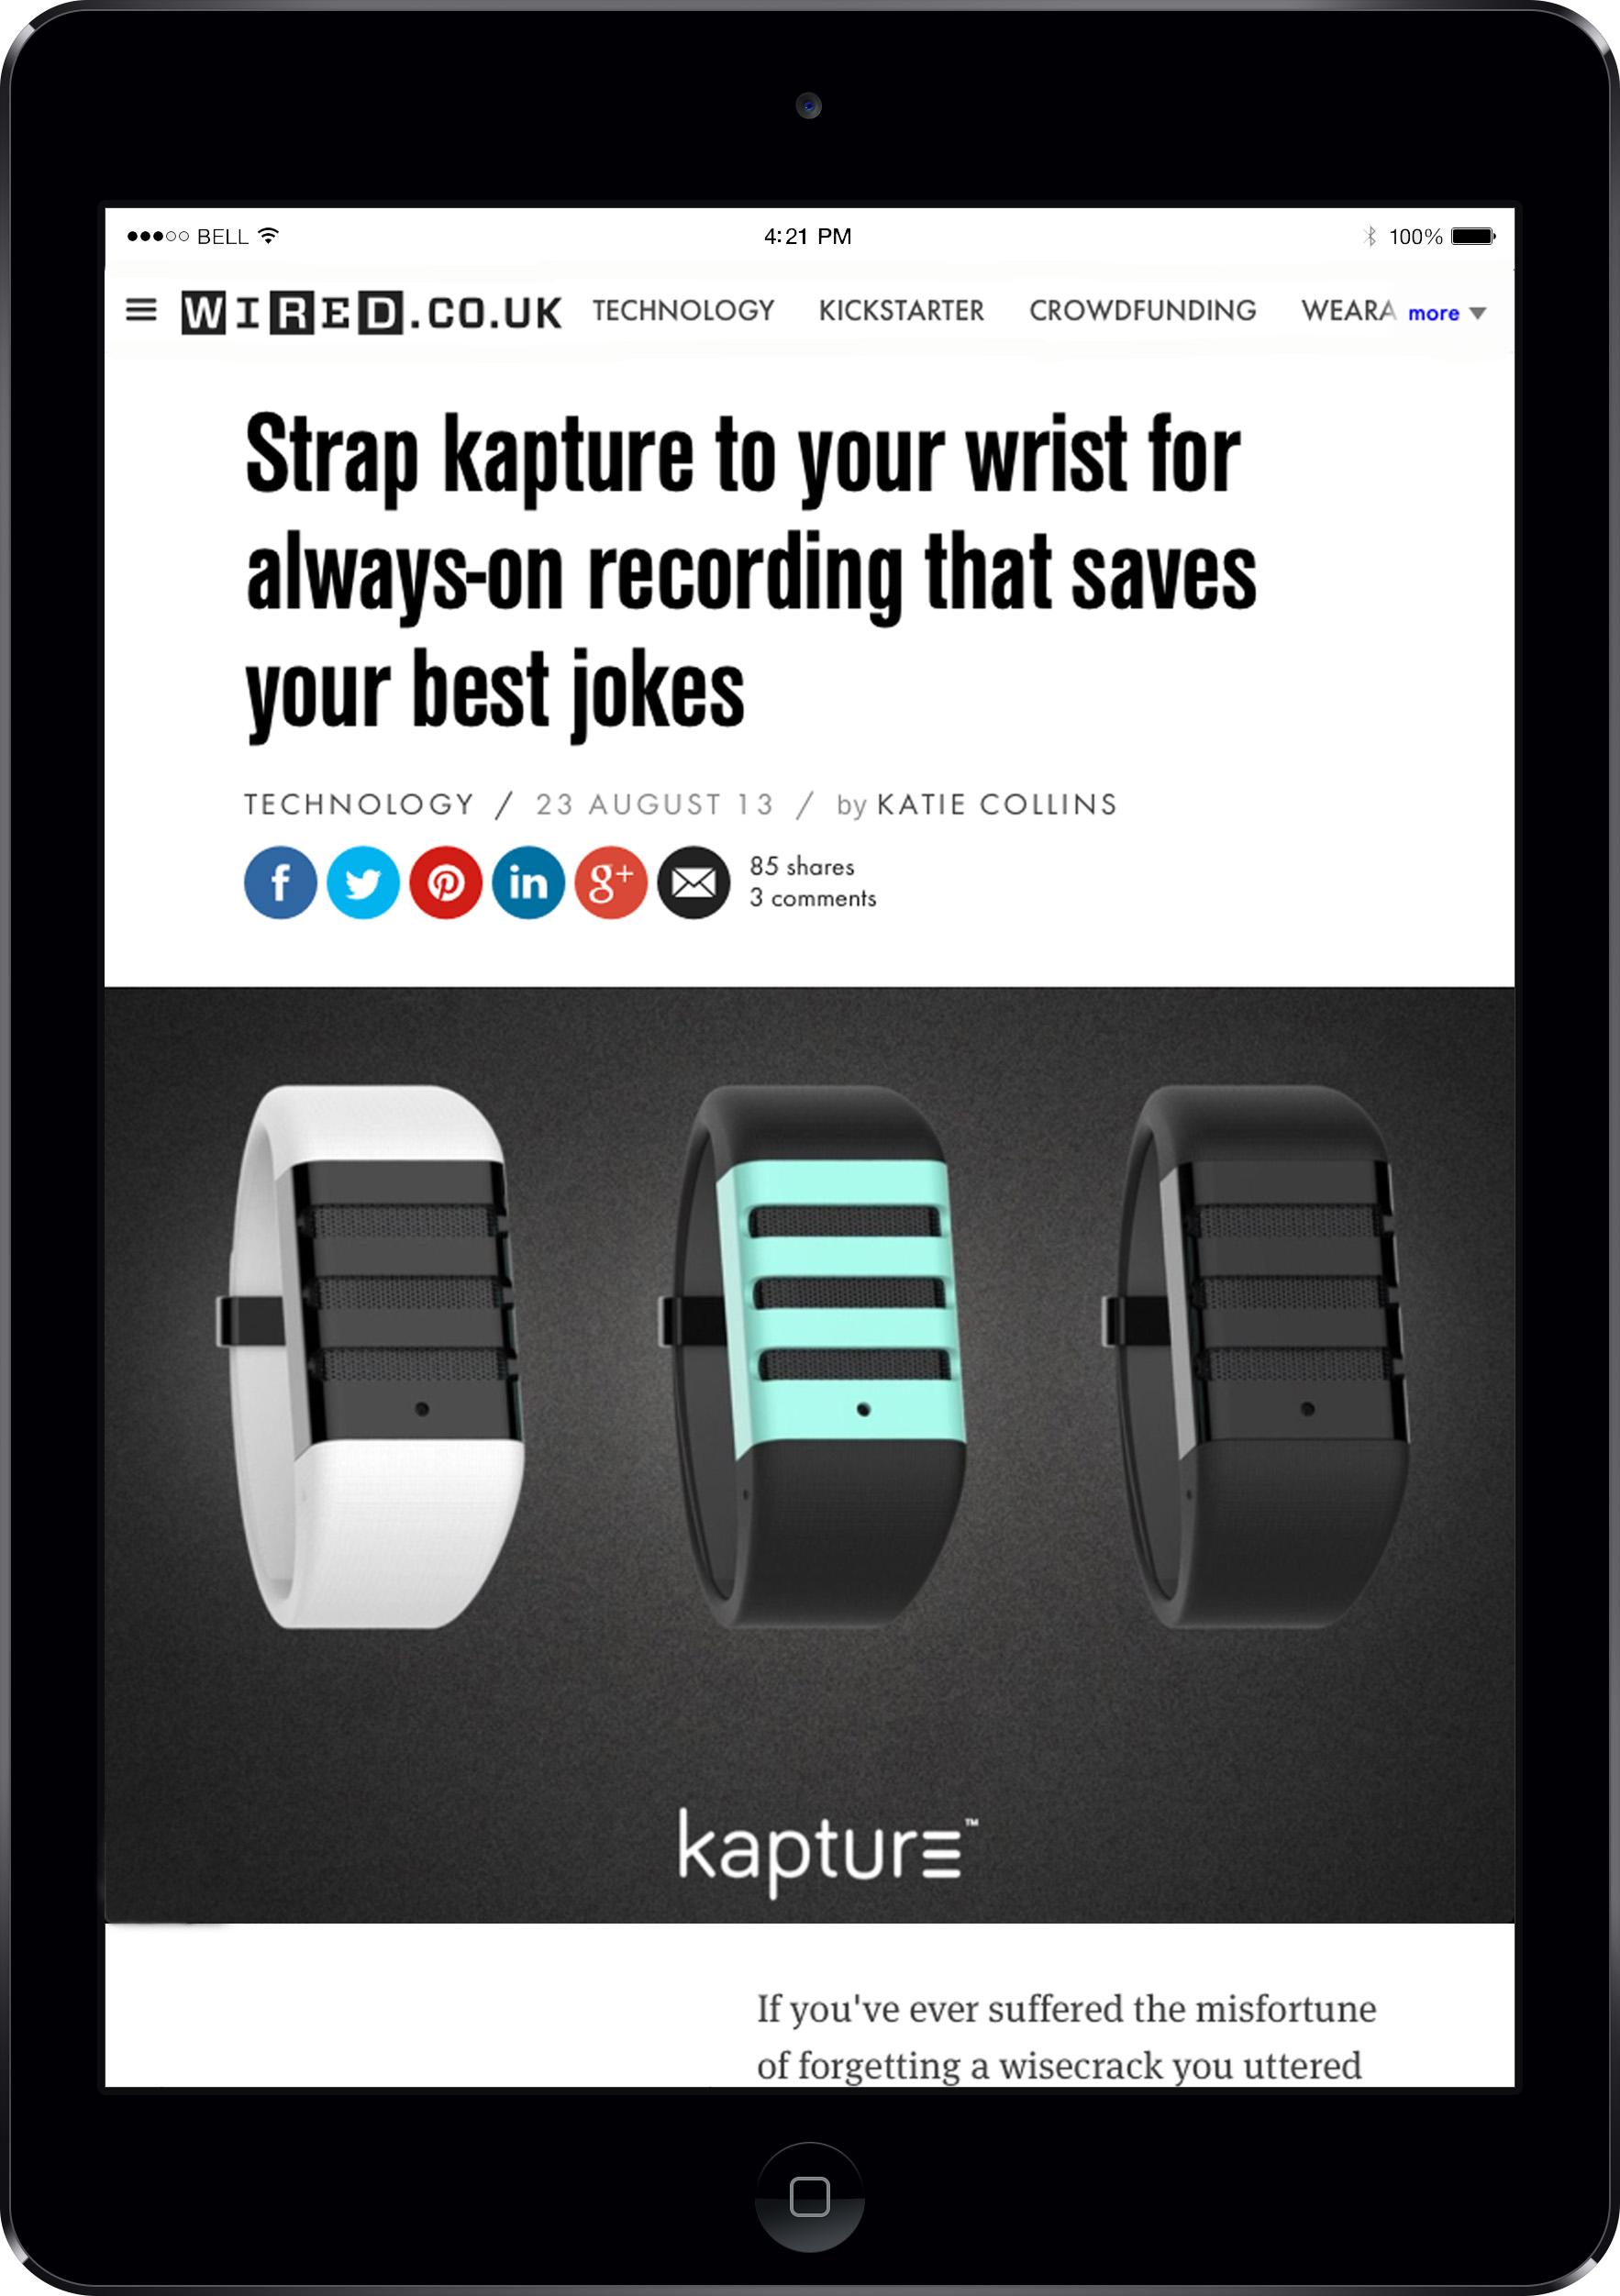 Kapture-Wired-iPad.jpg